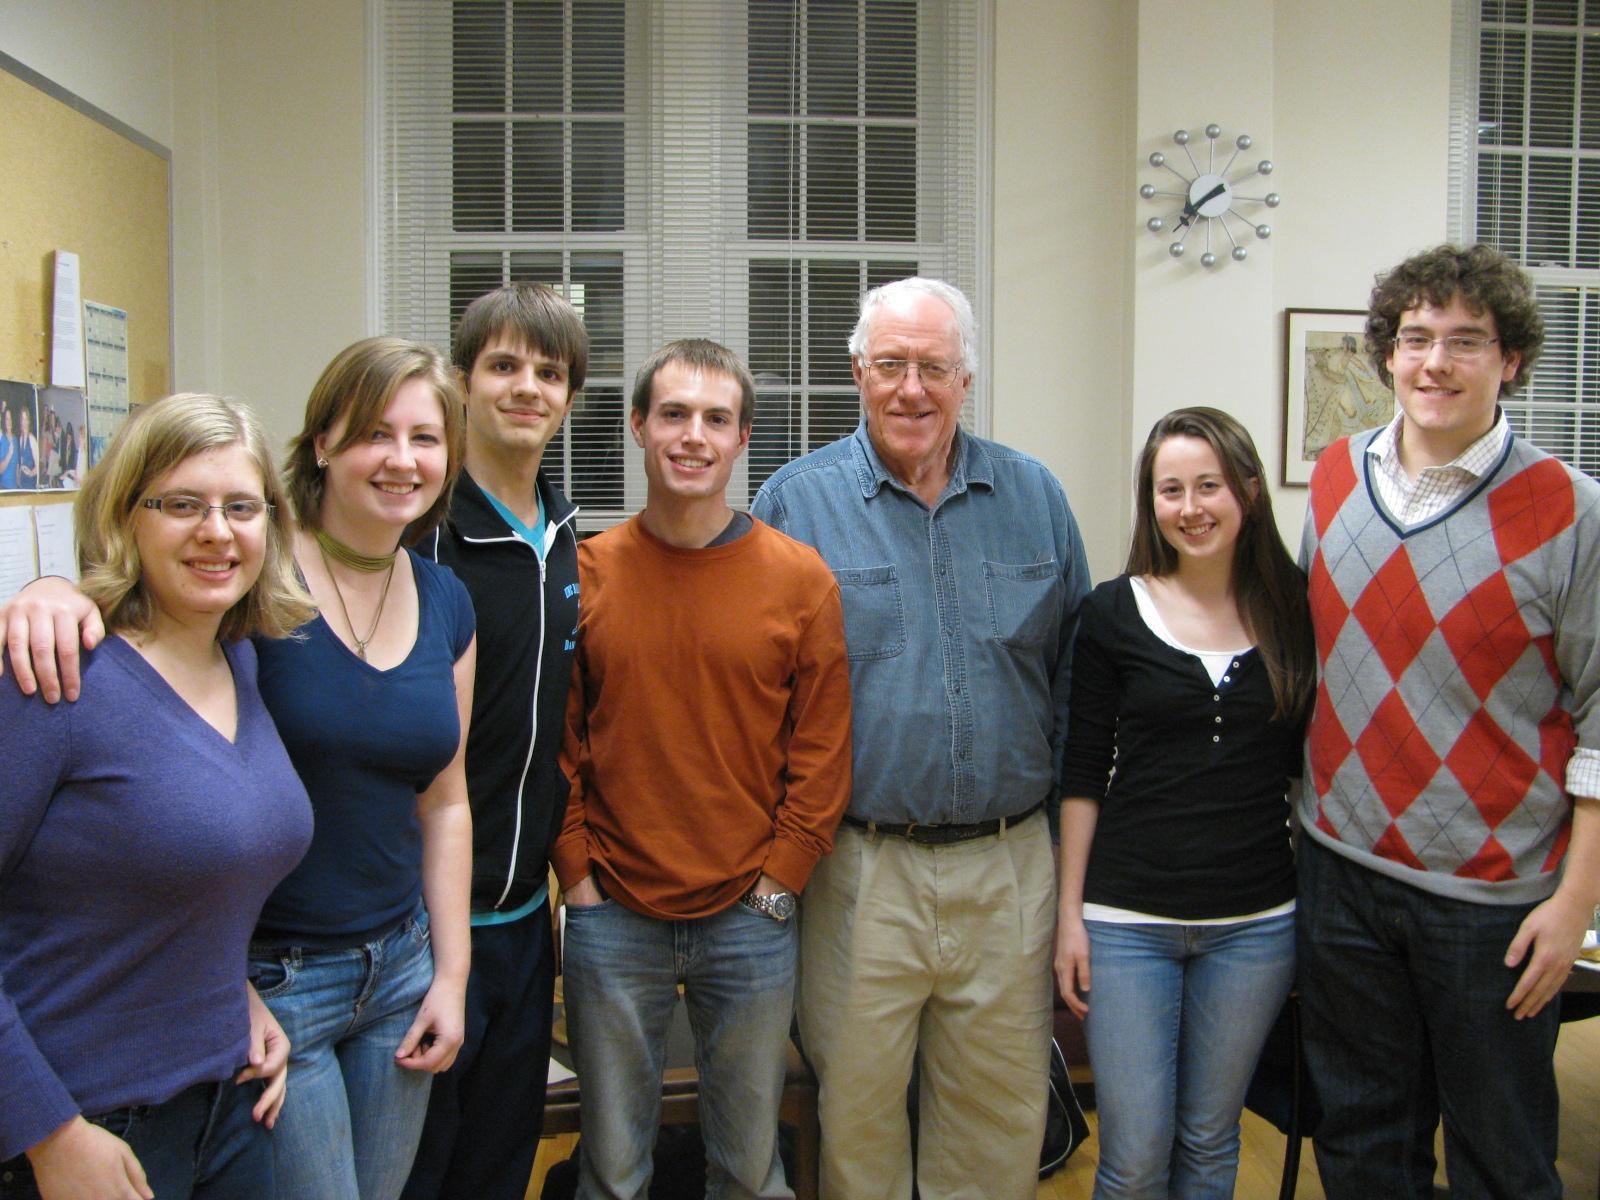 Edwin mack duke university masters thesis